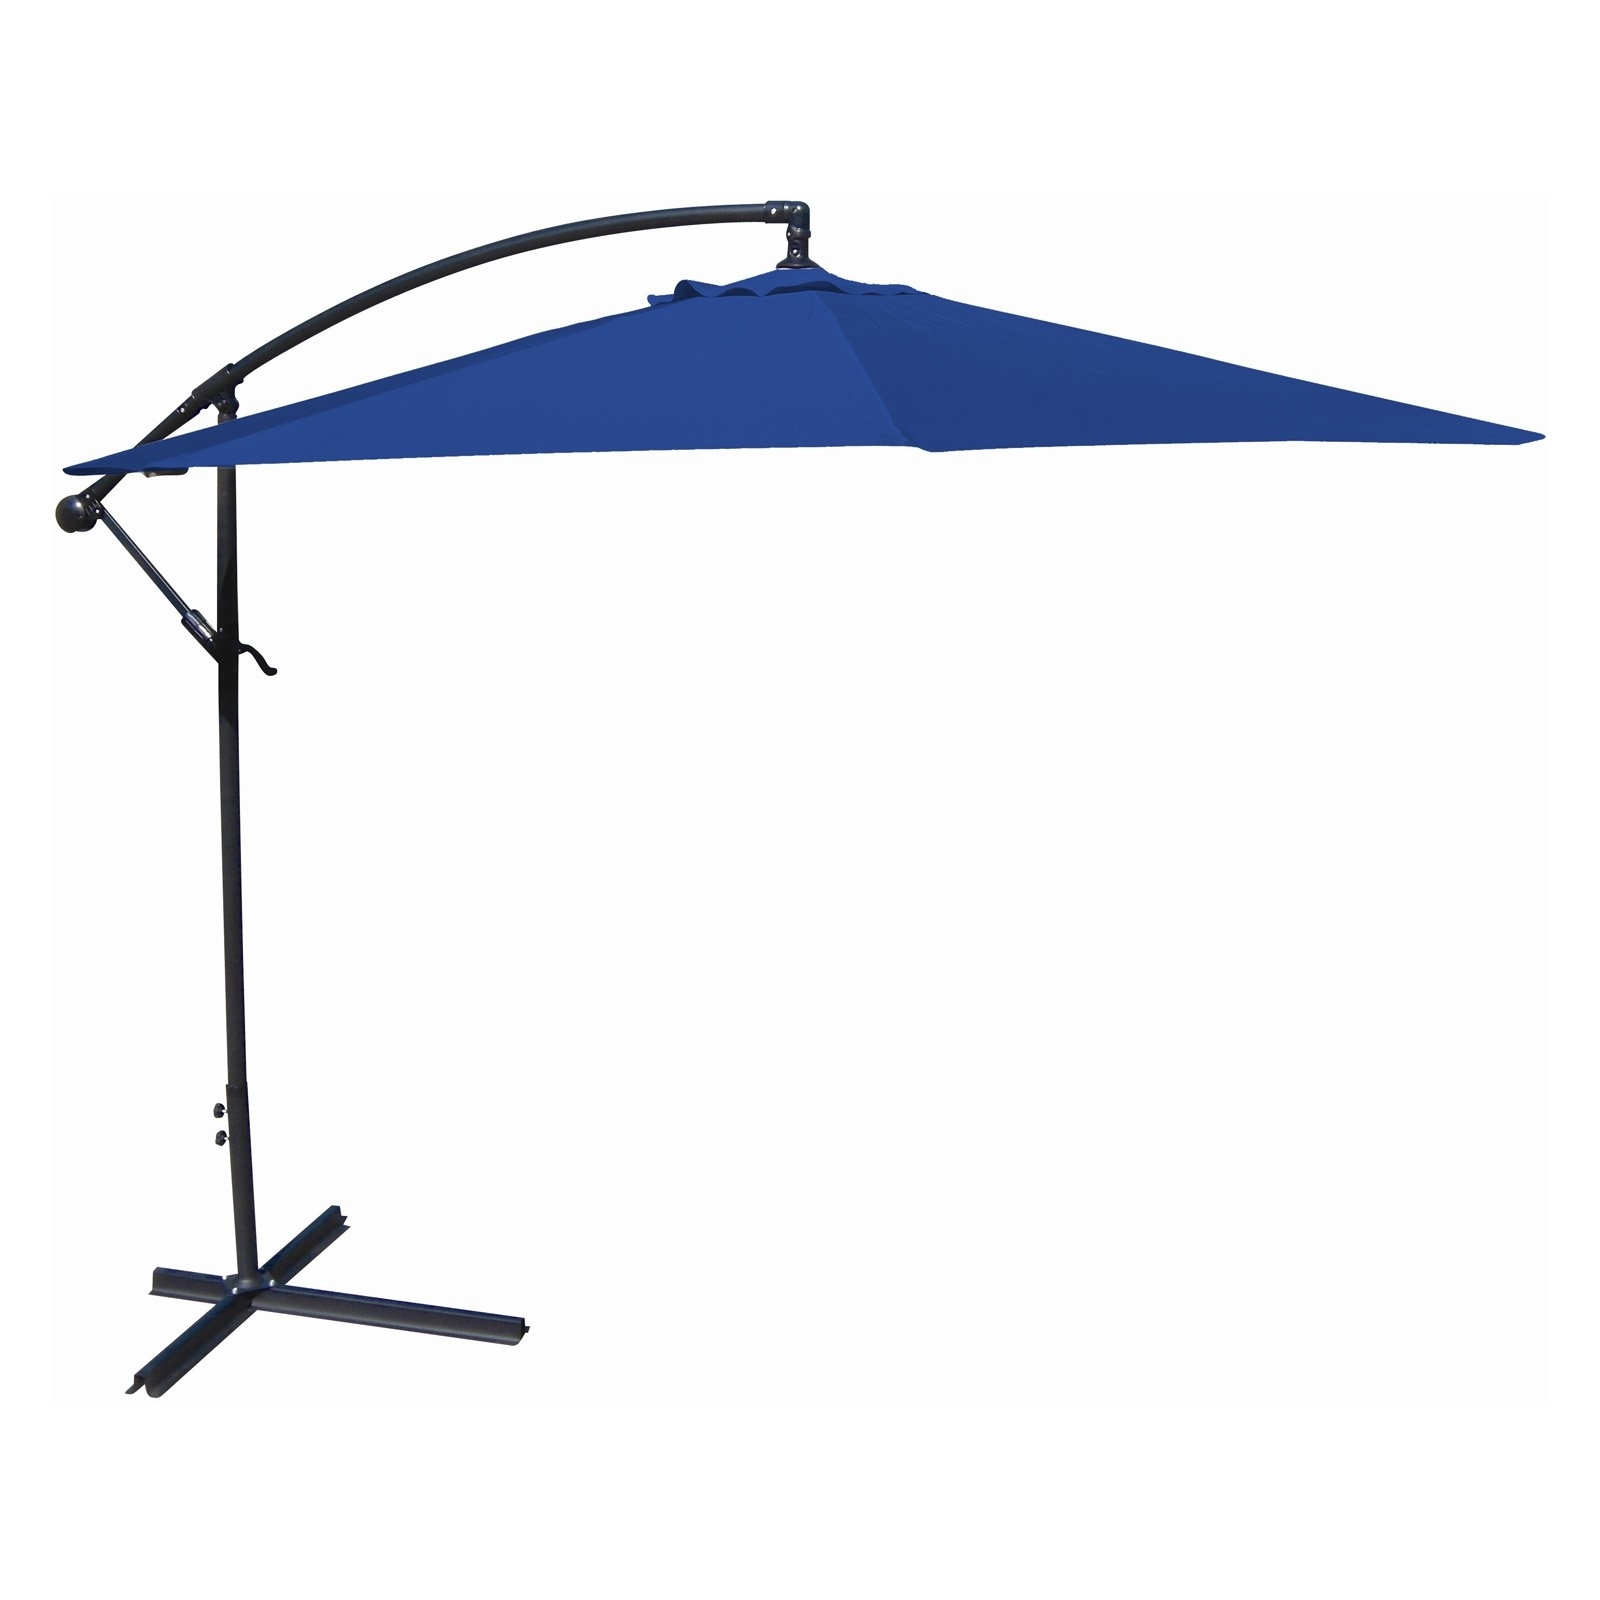 Jordan Manufacturing 10' Offset Umbrella, Multiple Colors – Walmart Intended For Preferred Jordan Patio Umbrellas (View 4 of 20)